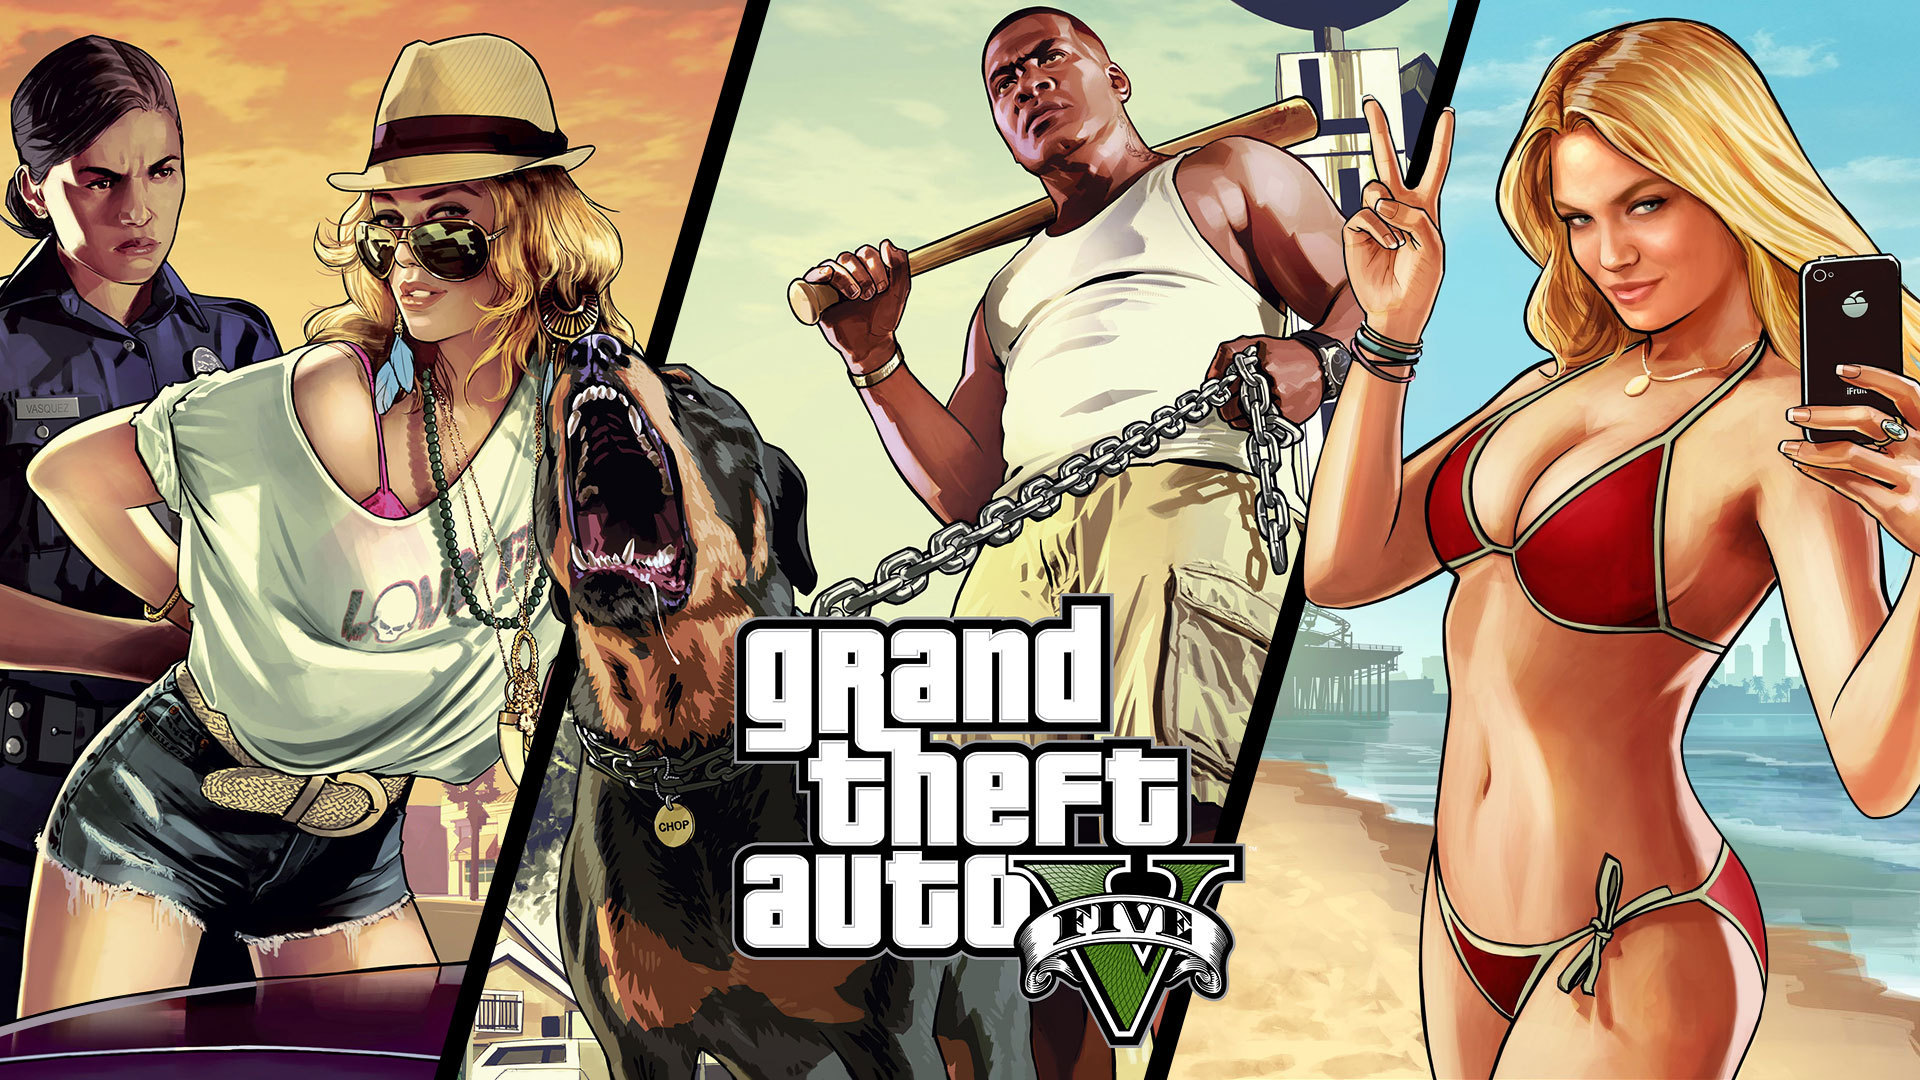 Fonds d'écran Jeux Vidéo GTA 5 gta 5